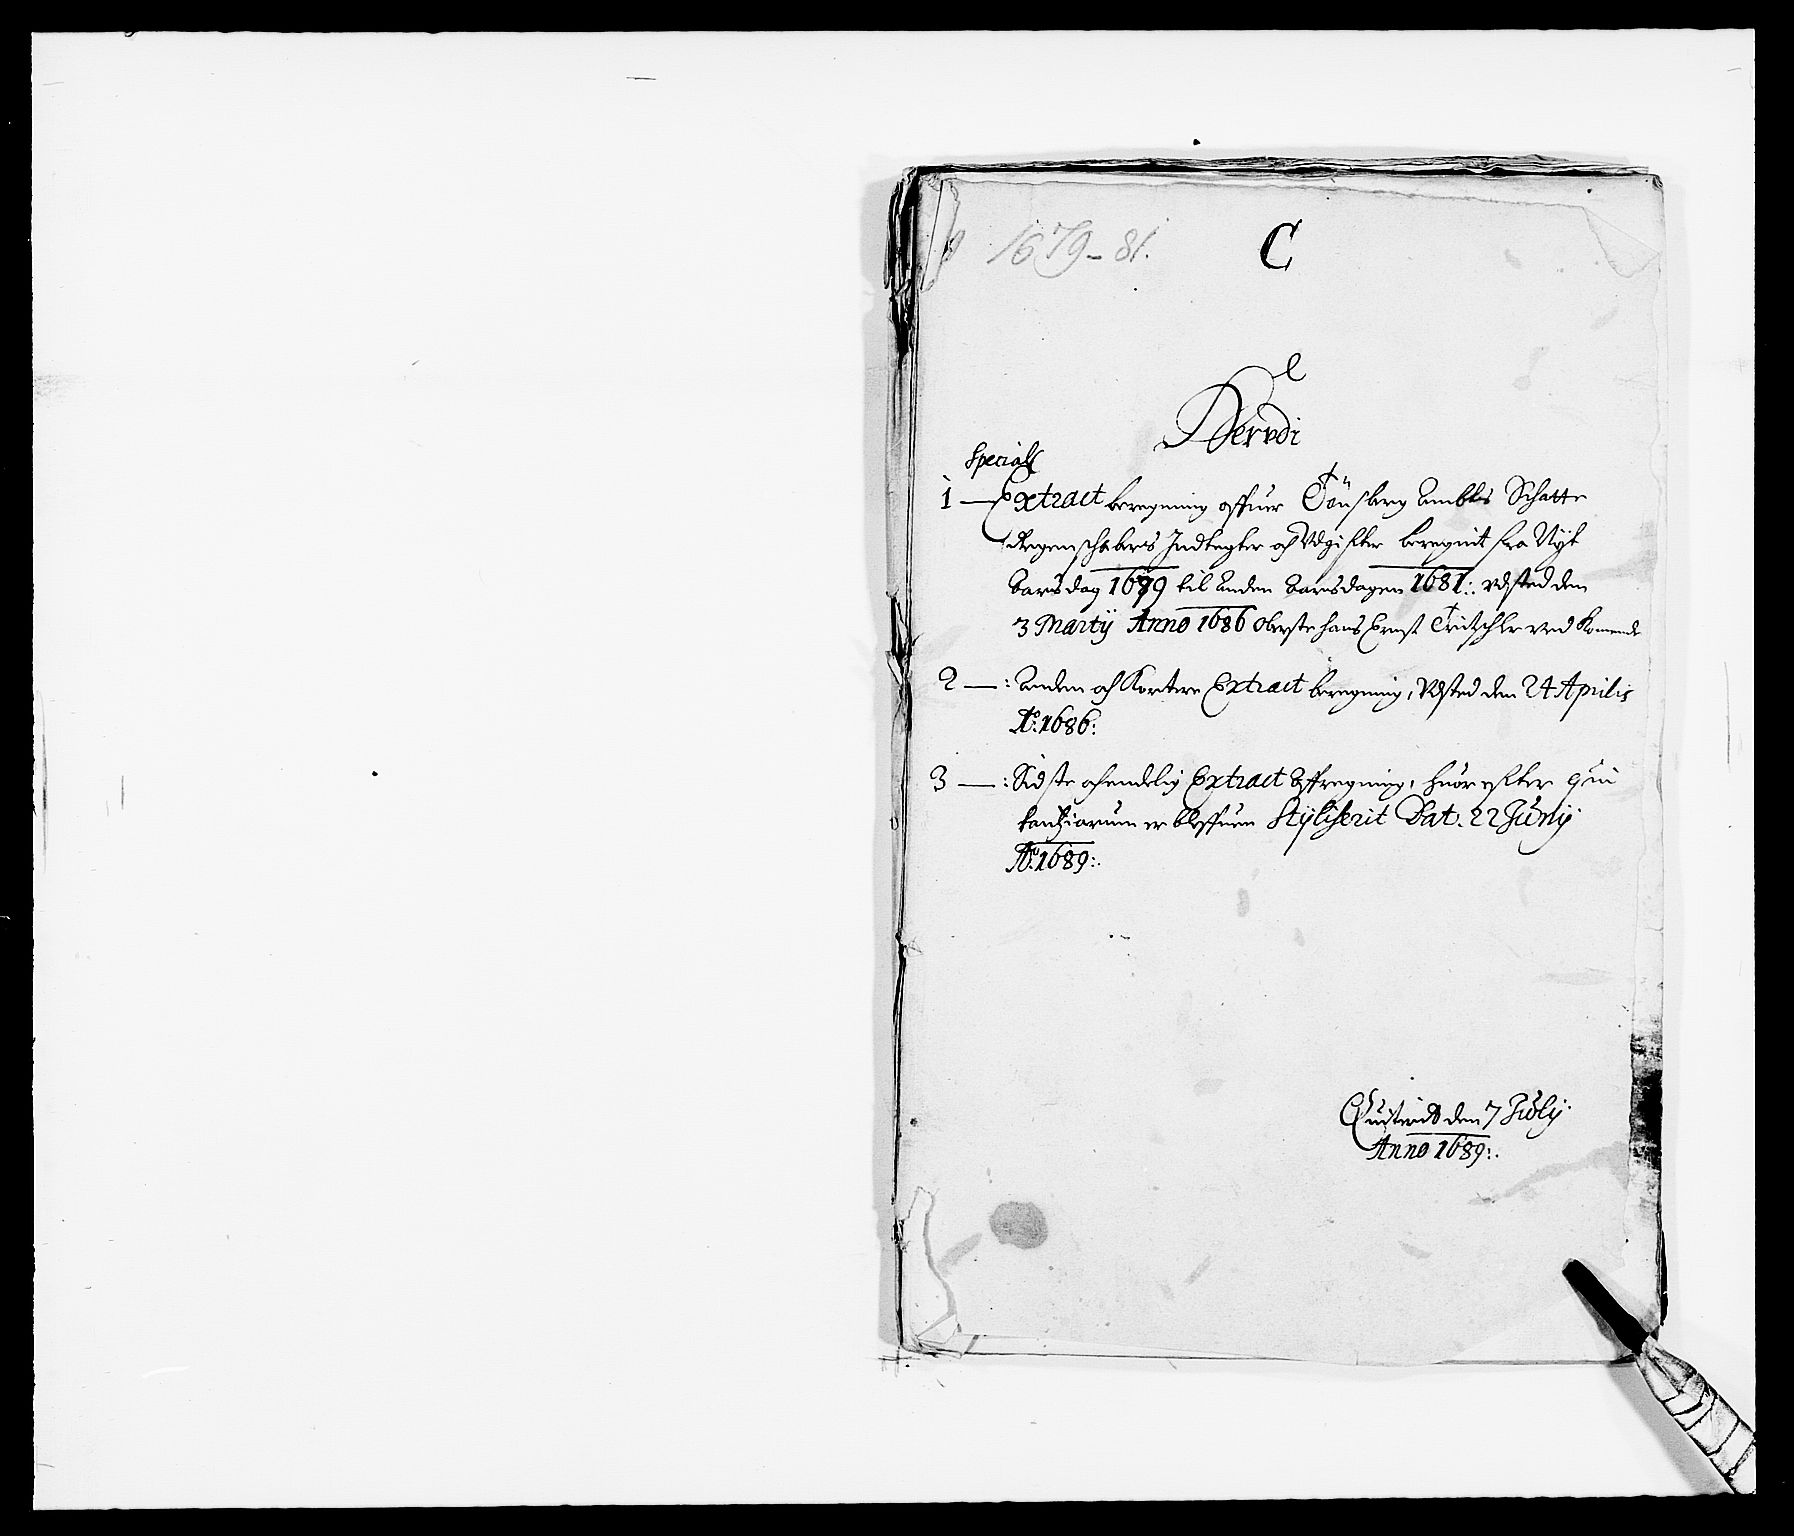 RA, Rentekammeret inntil 1814, Reviderte regnskaper, Fogderegnskap, R32/L1849: Fogderegnskap Jarlsberg grevskap, 1679-1680, s. 38